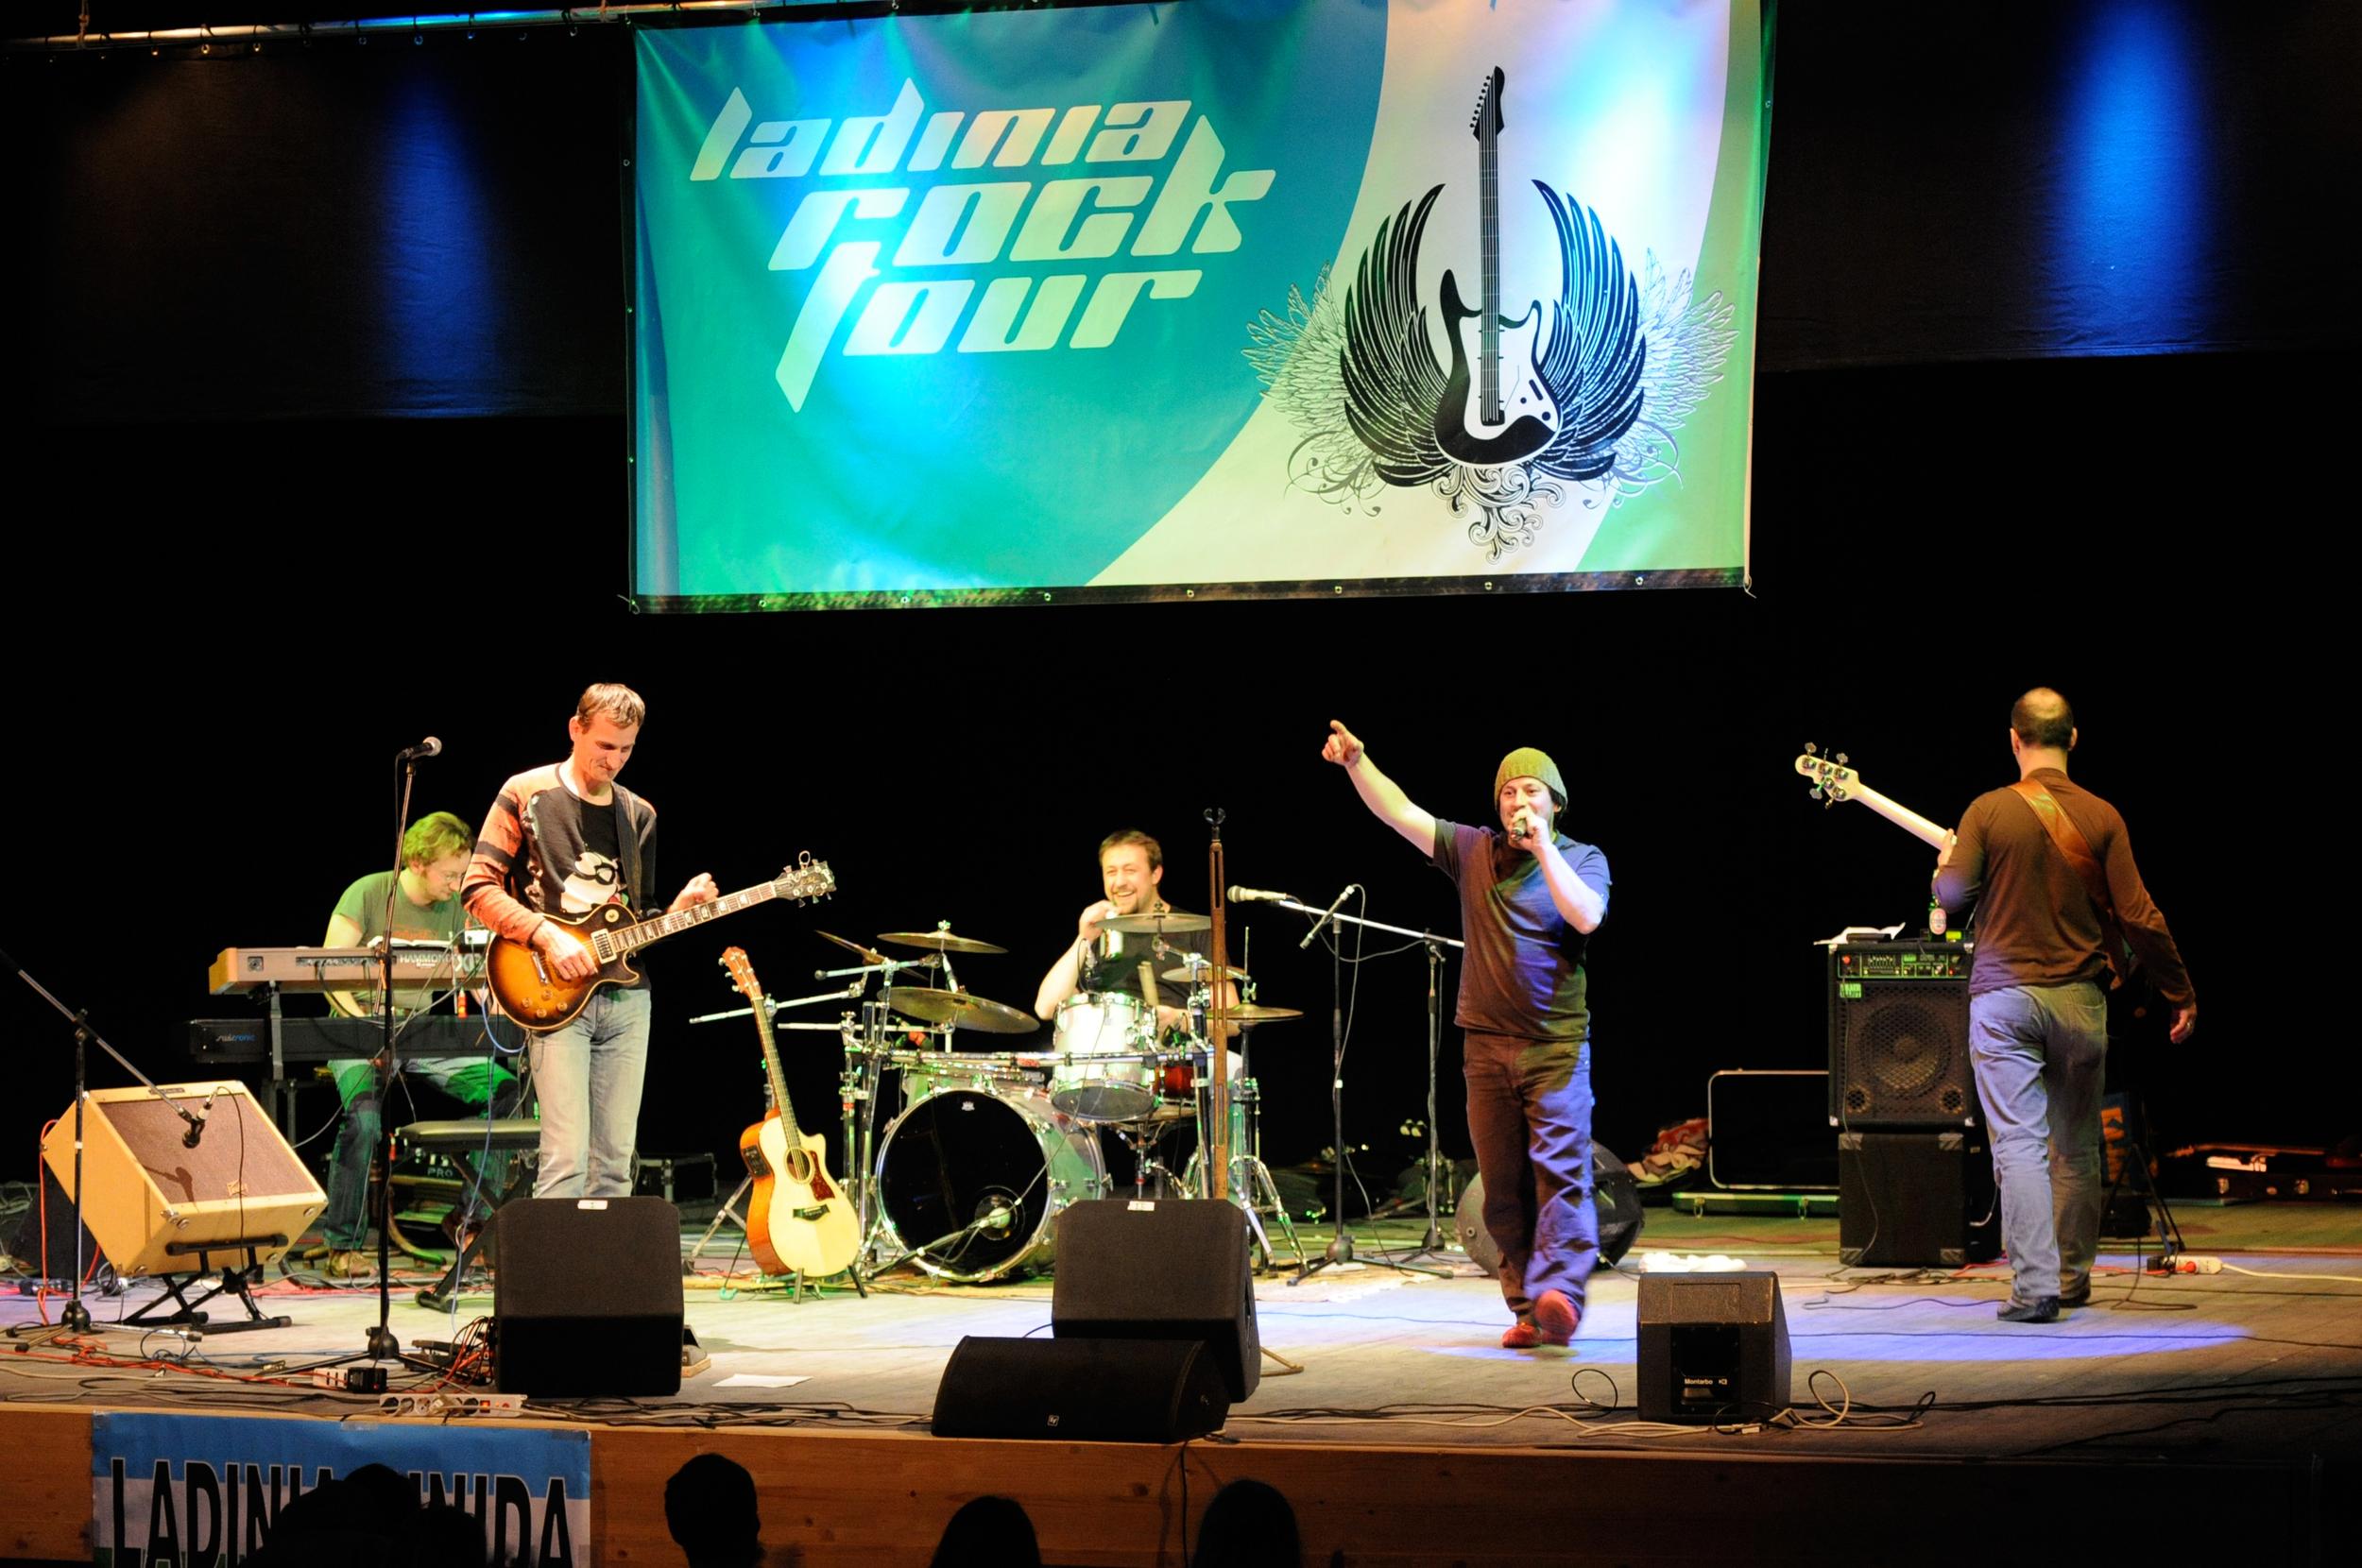 ladinia_rock_festival_7.jpg